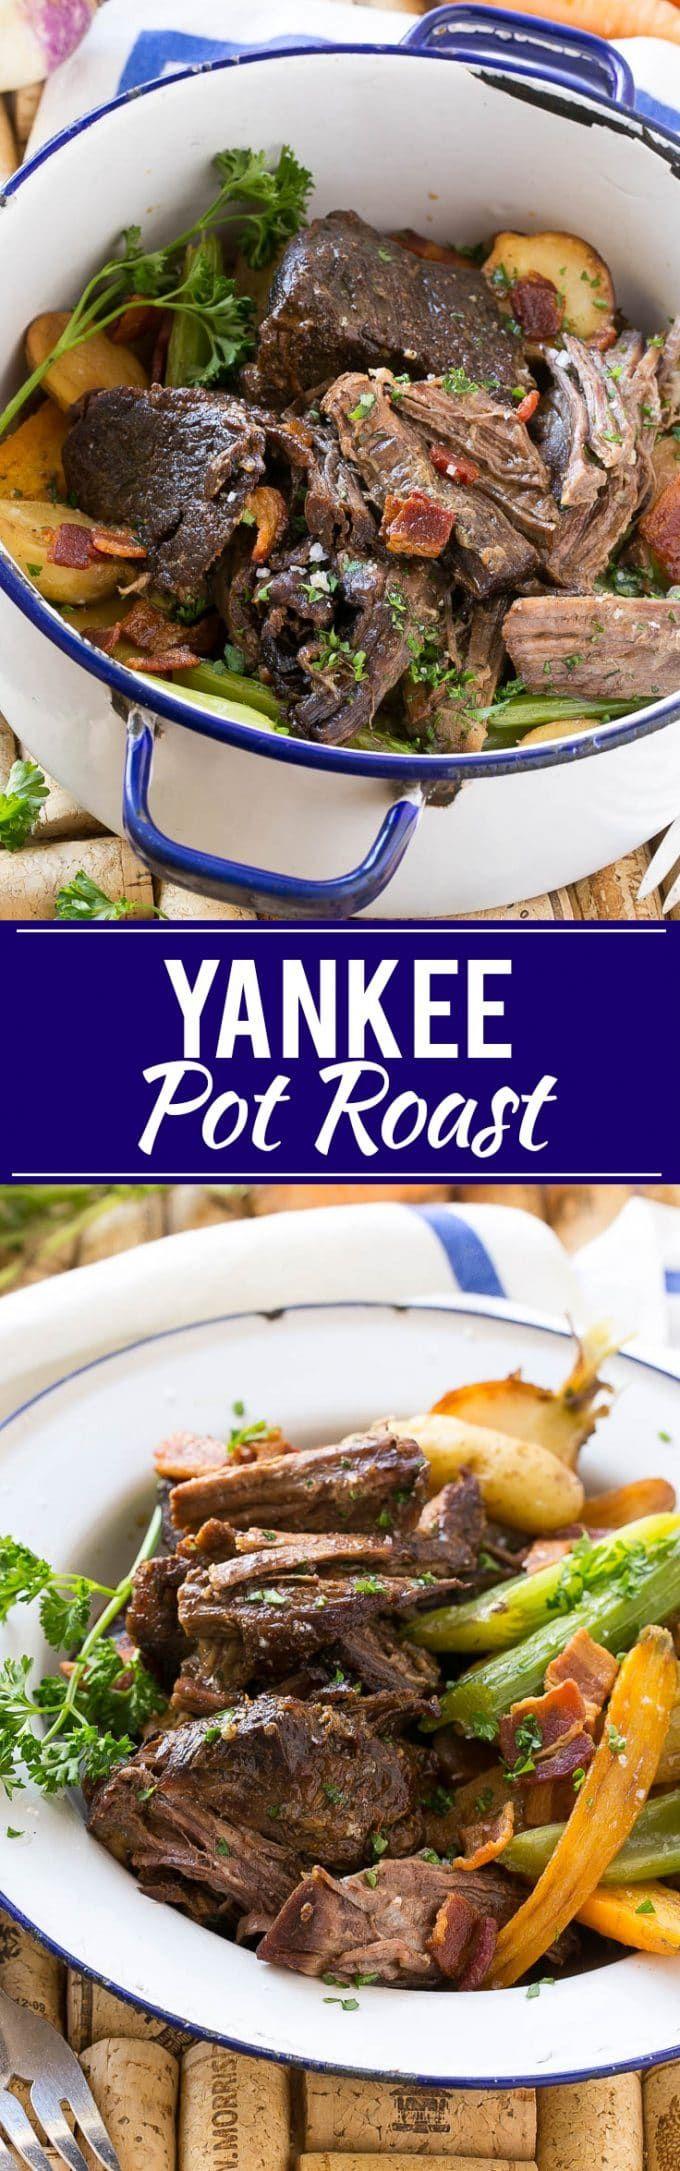 Yankee Pot Roast Recipe | Easy Yankee Pot Roast | Best Yankee Pot Roast | Easy Pot Roast | Best Pot Roast